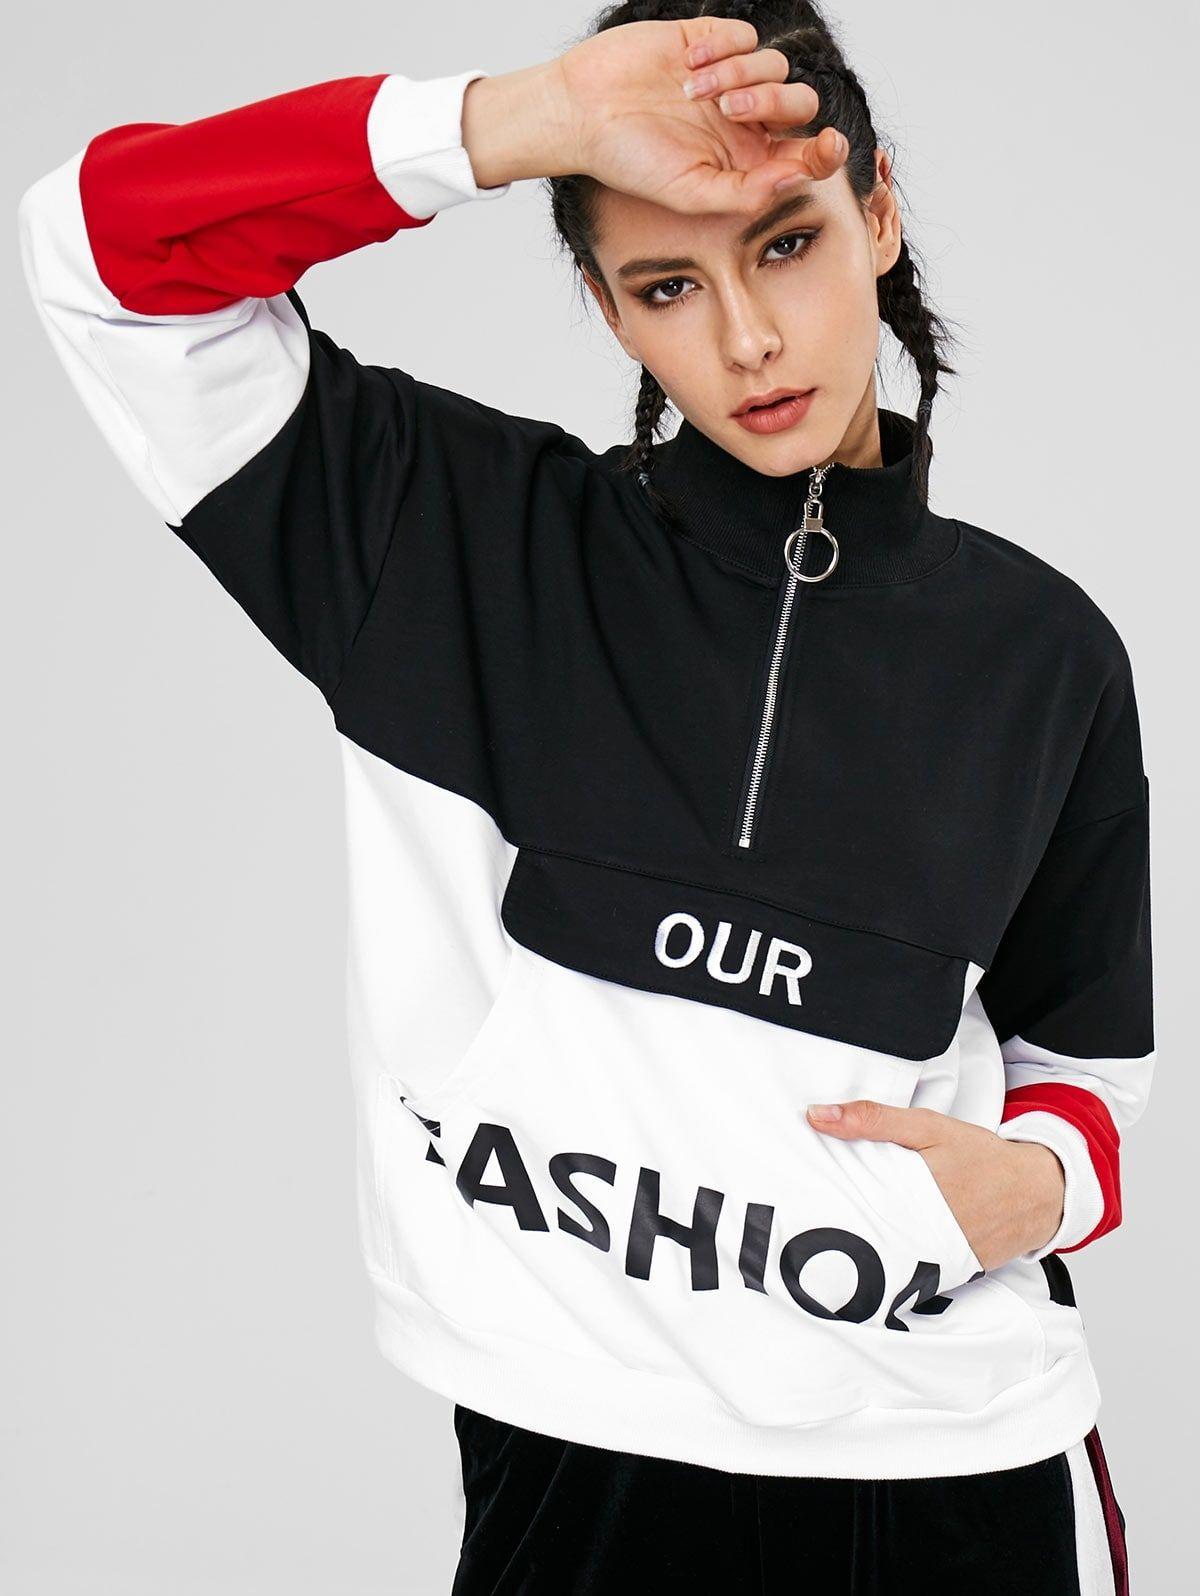 Color Block Pouch Graphic Sports Sweatshirt Black Affiliate Pouch Block Color Graphic Blac Sports Sweatshirts Sports Jackets Women Workout Hoodie [ 1596 x 1200 Pixel ]